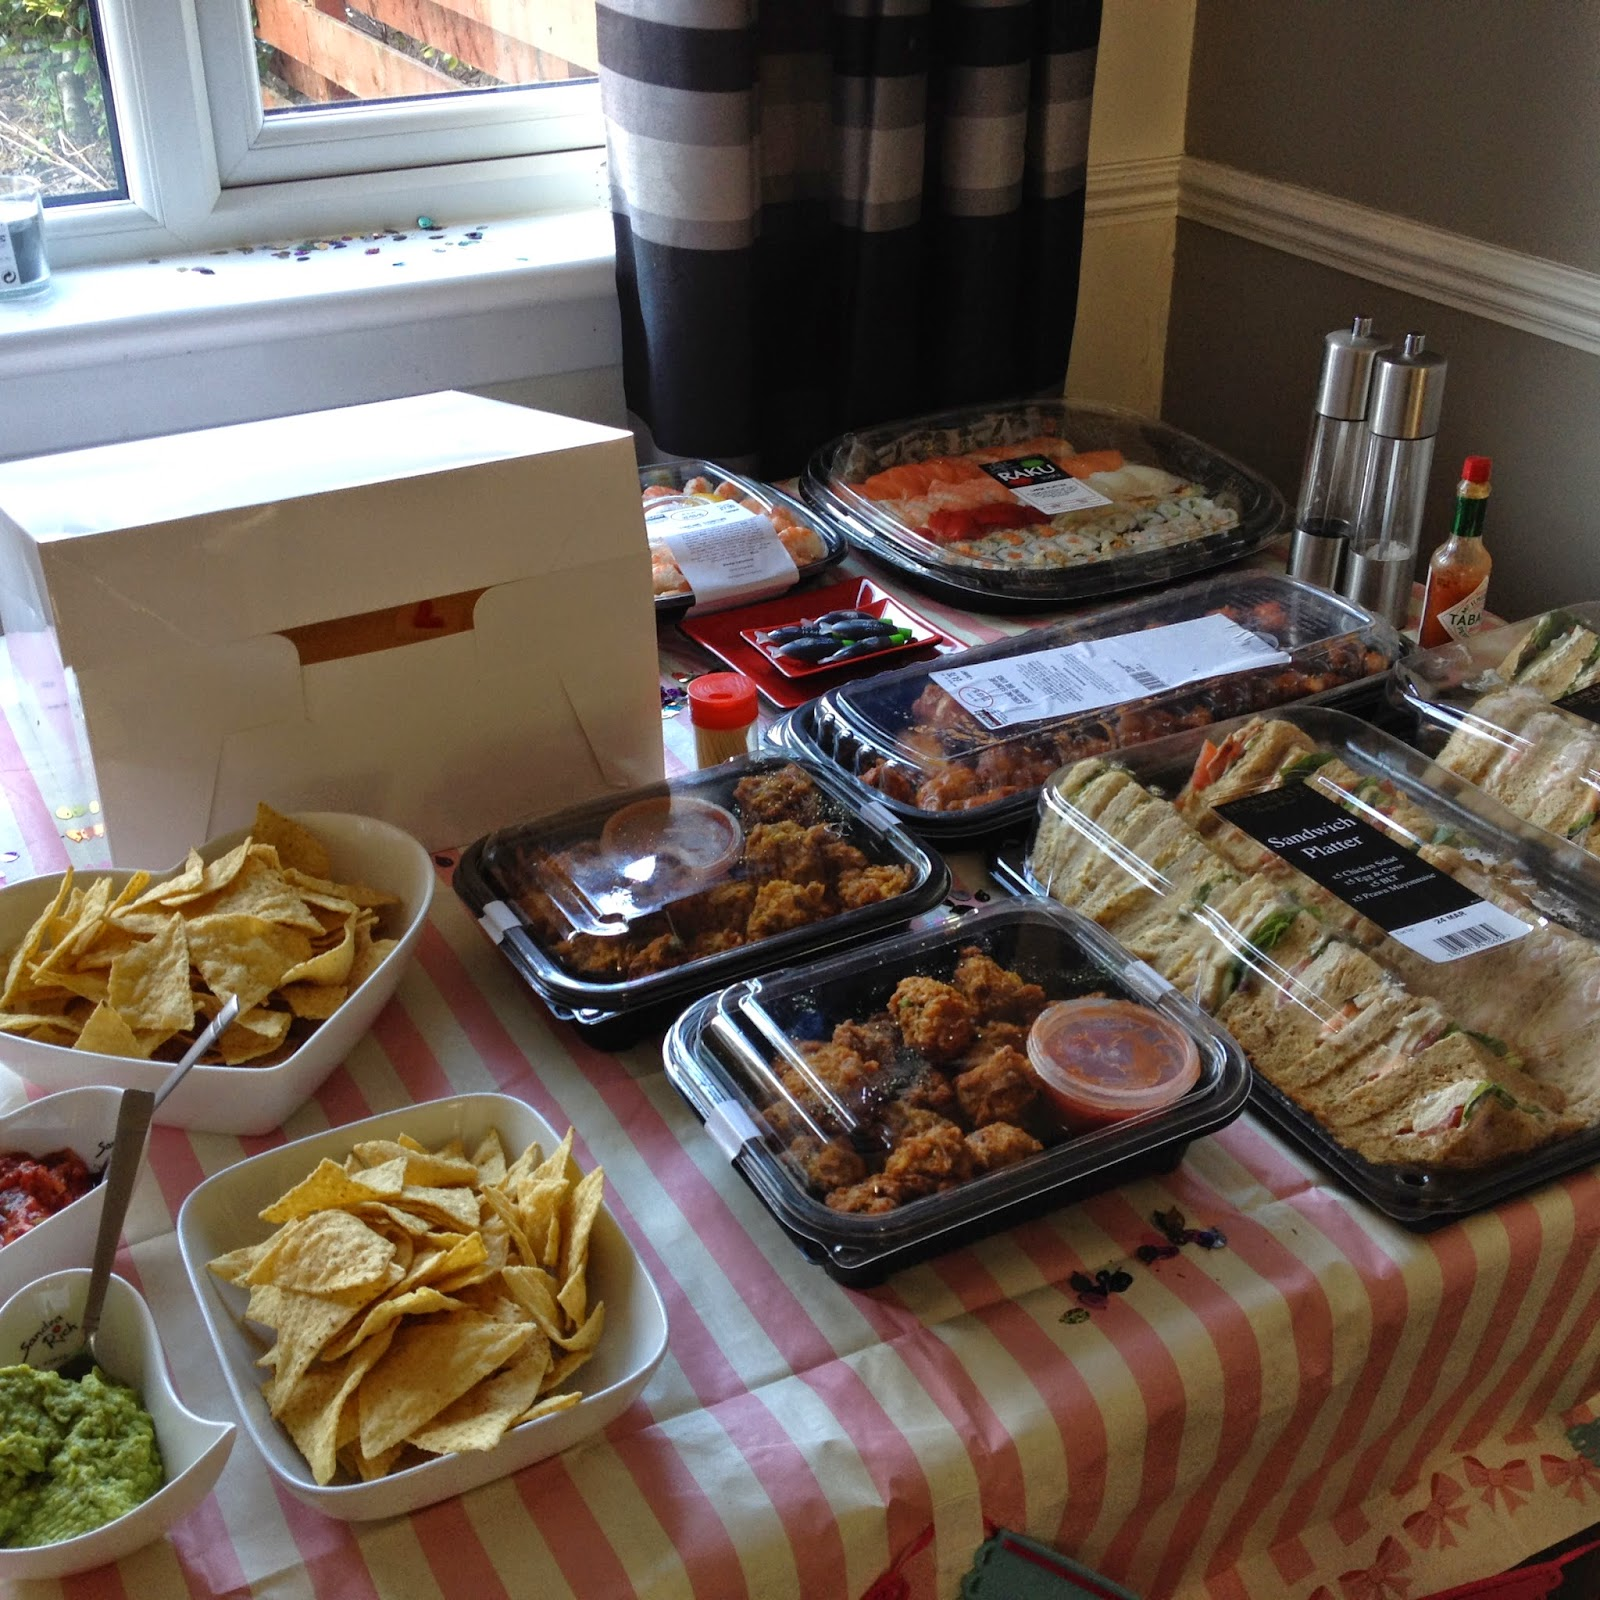 Food, Food, Food, Love Food: Emily's 'Home' Hen Do